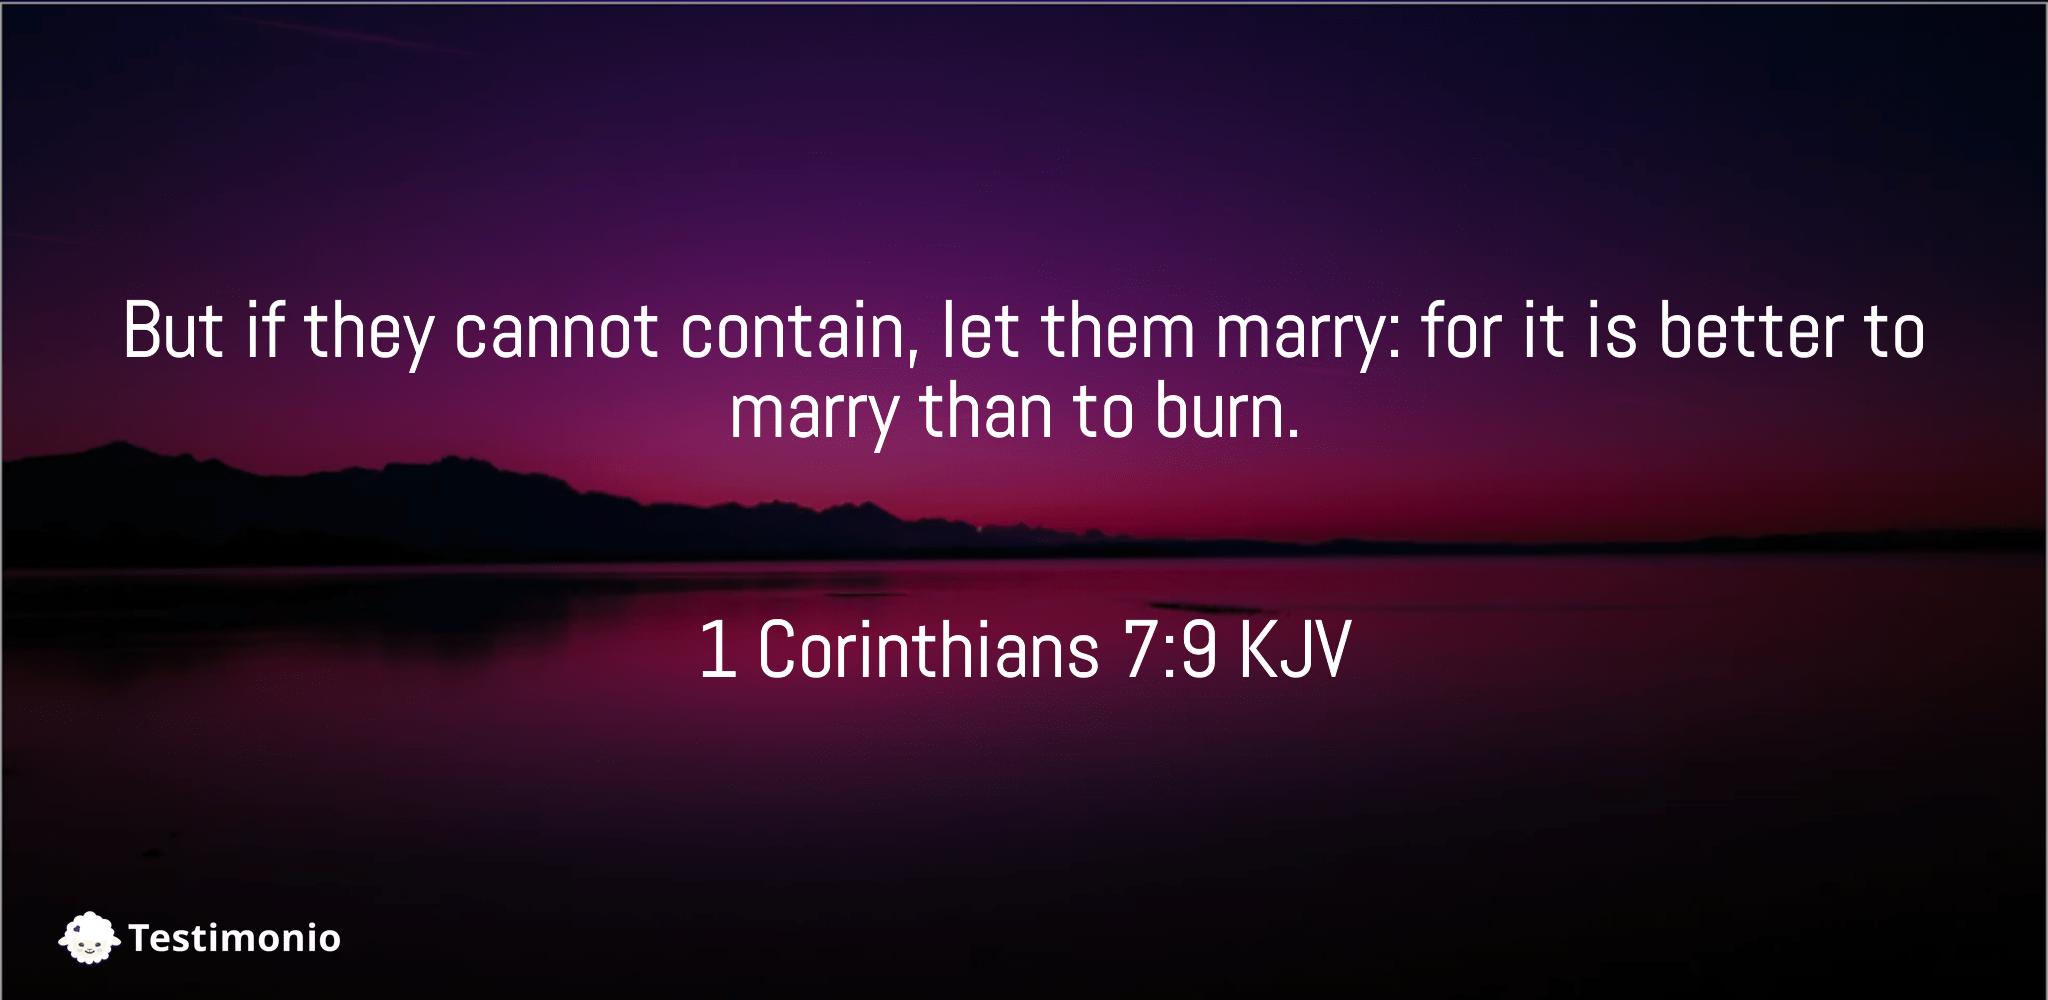 1 Corinthians 7:9